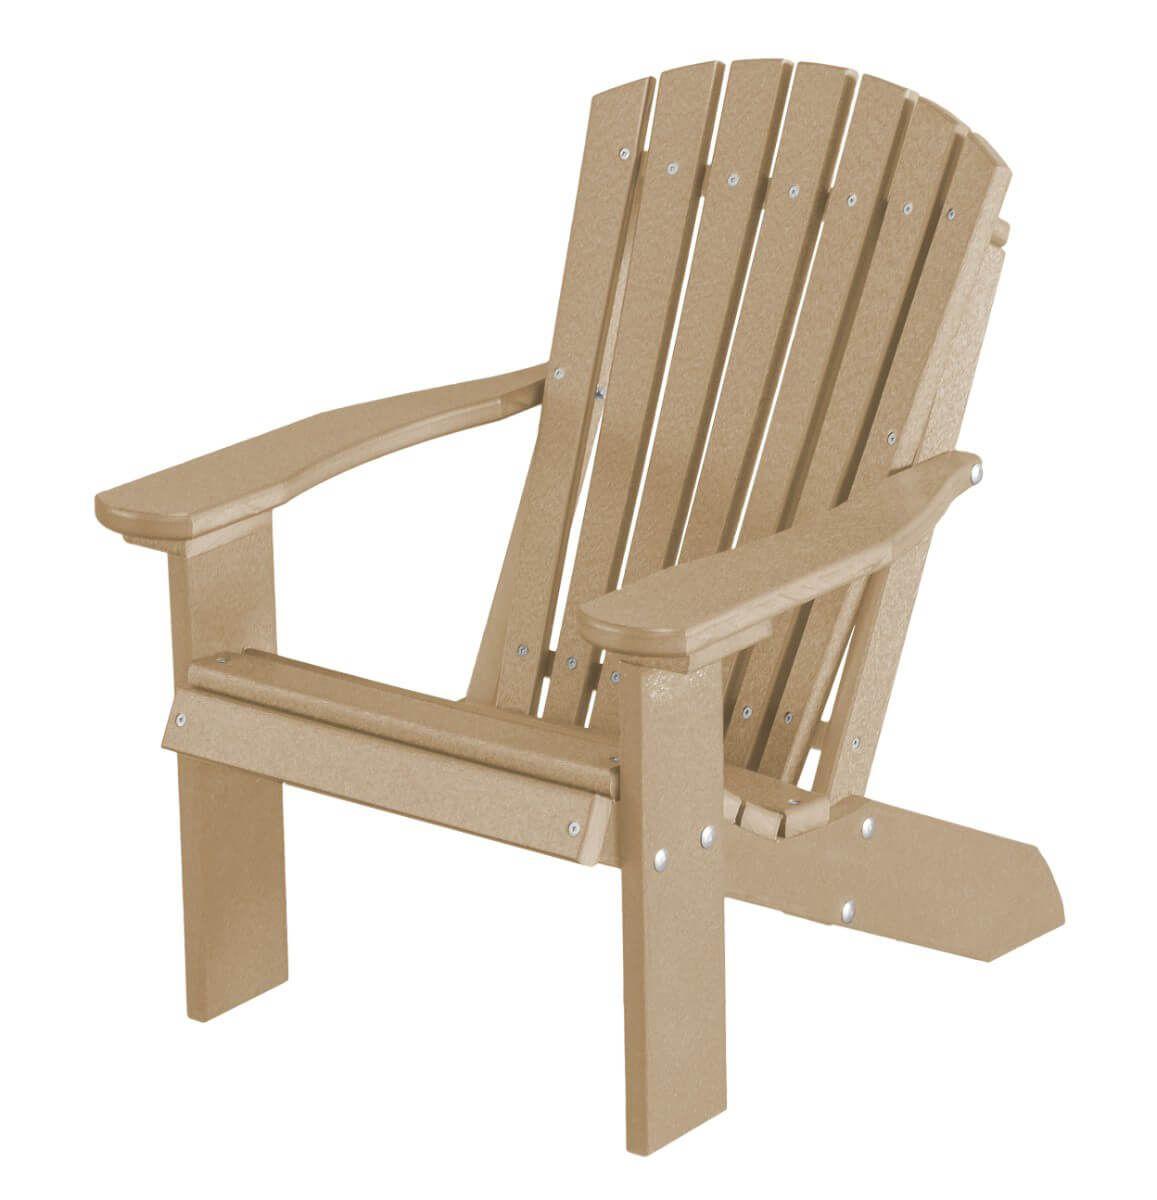 Weathered Wood Sidra Child's Adirondack Chair